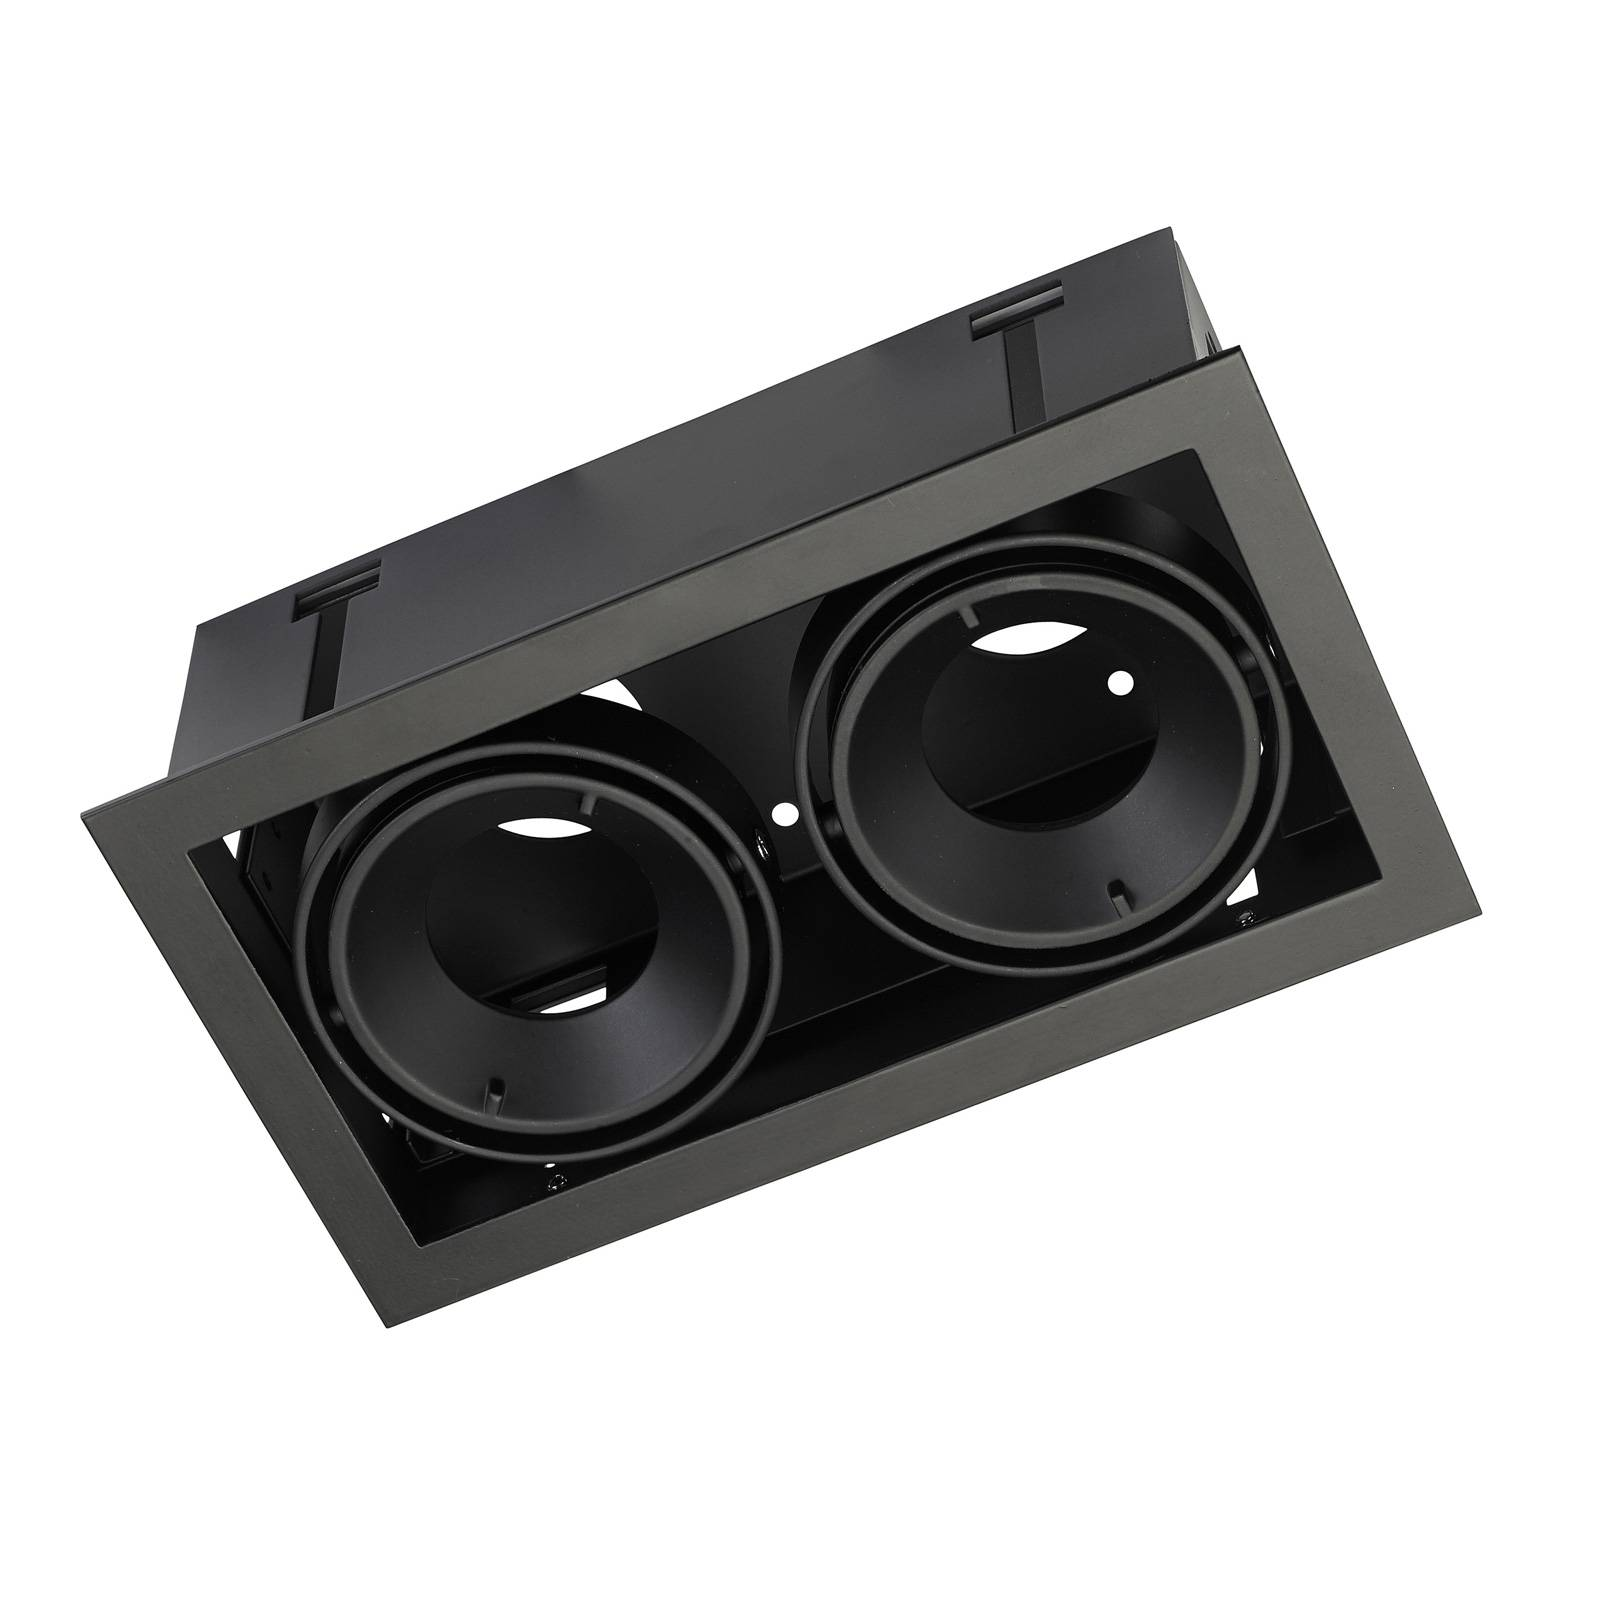 LEDS-C4 Multidir Evo S -uppovalokotelo, musta